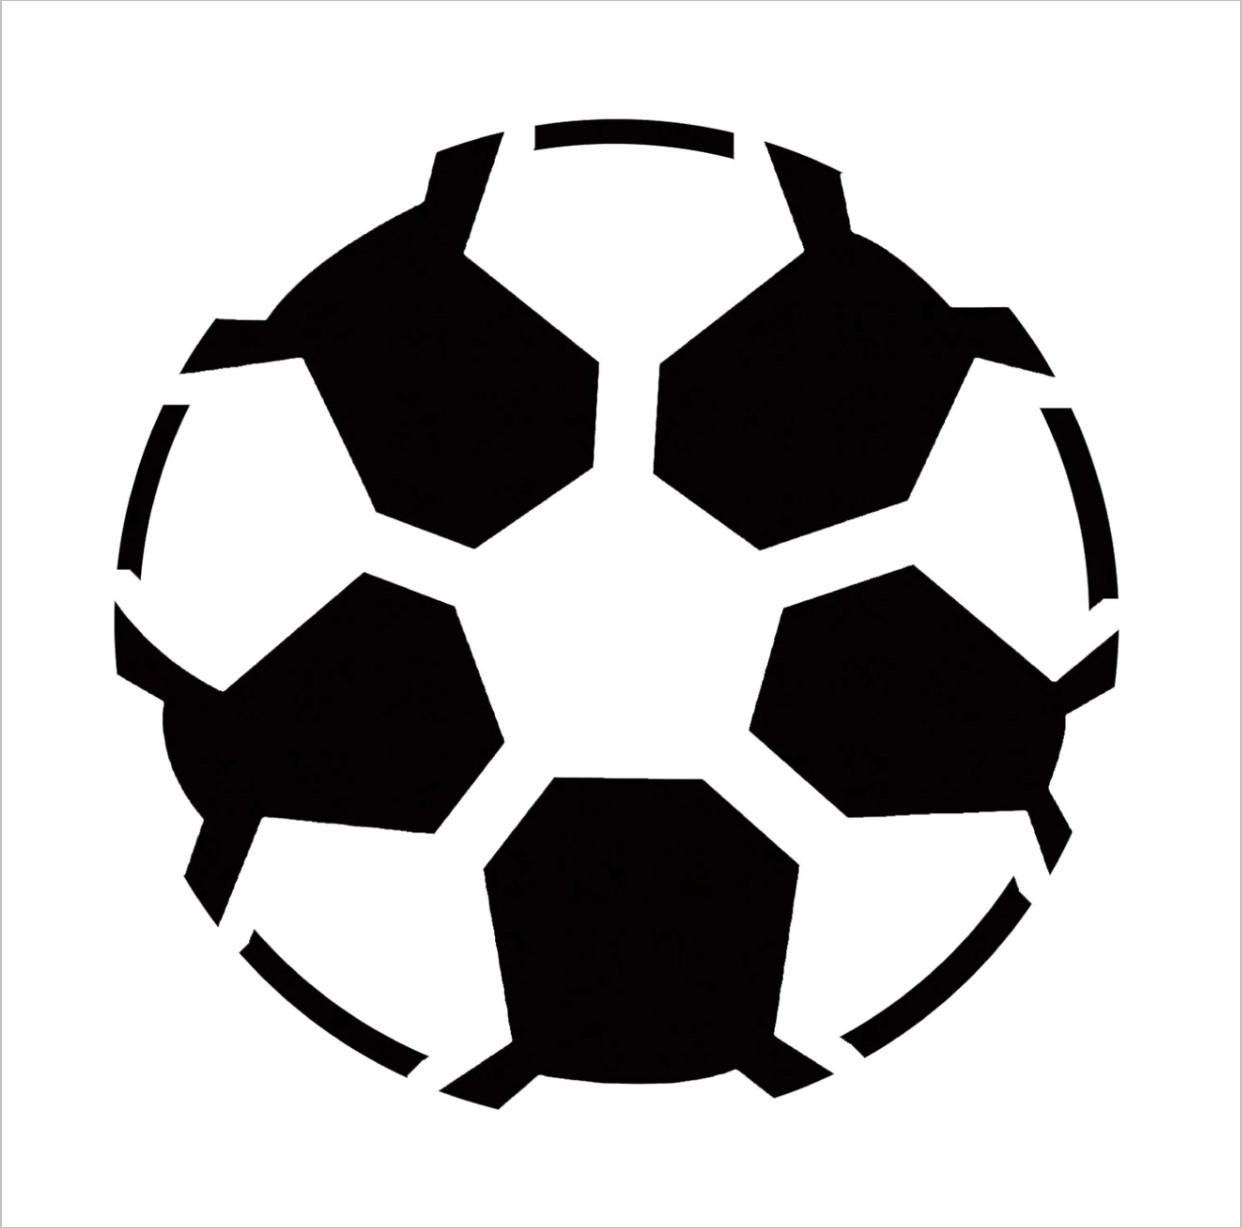 Soccer Ball Professional Stencil Insert